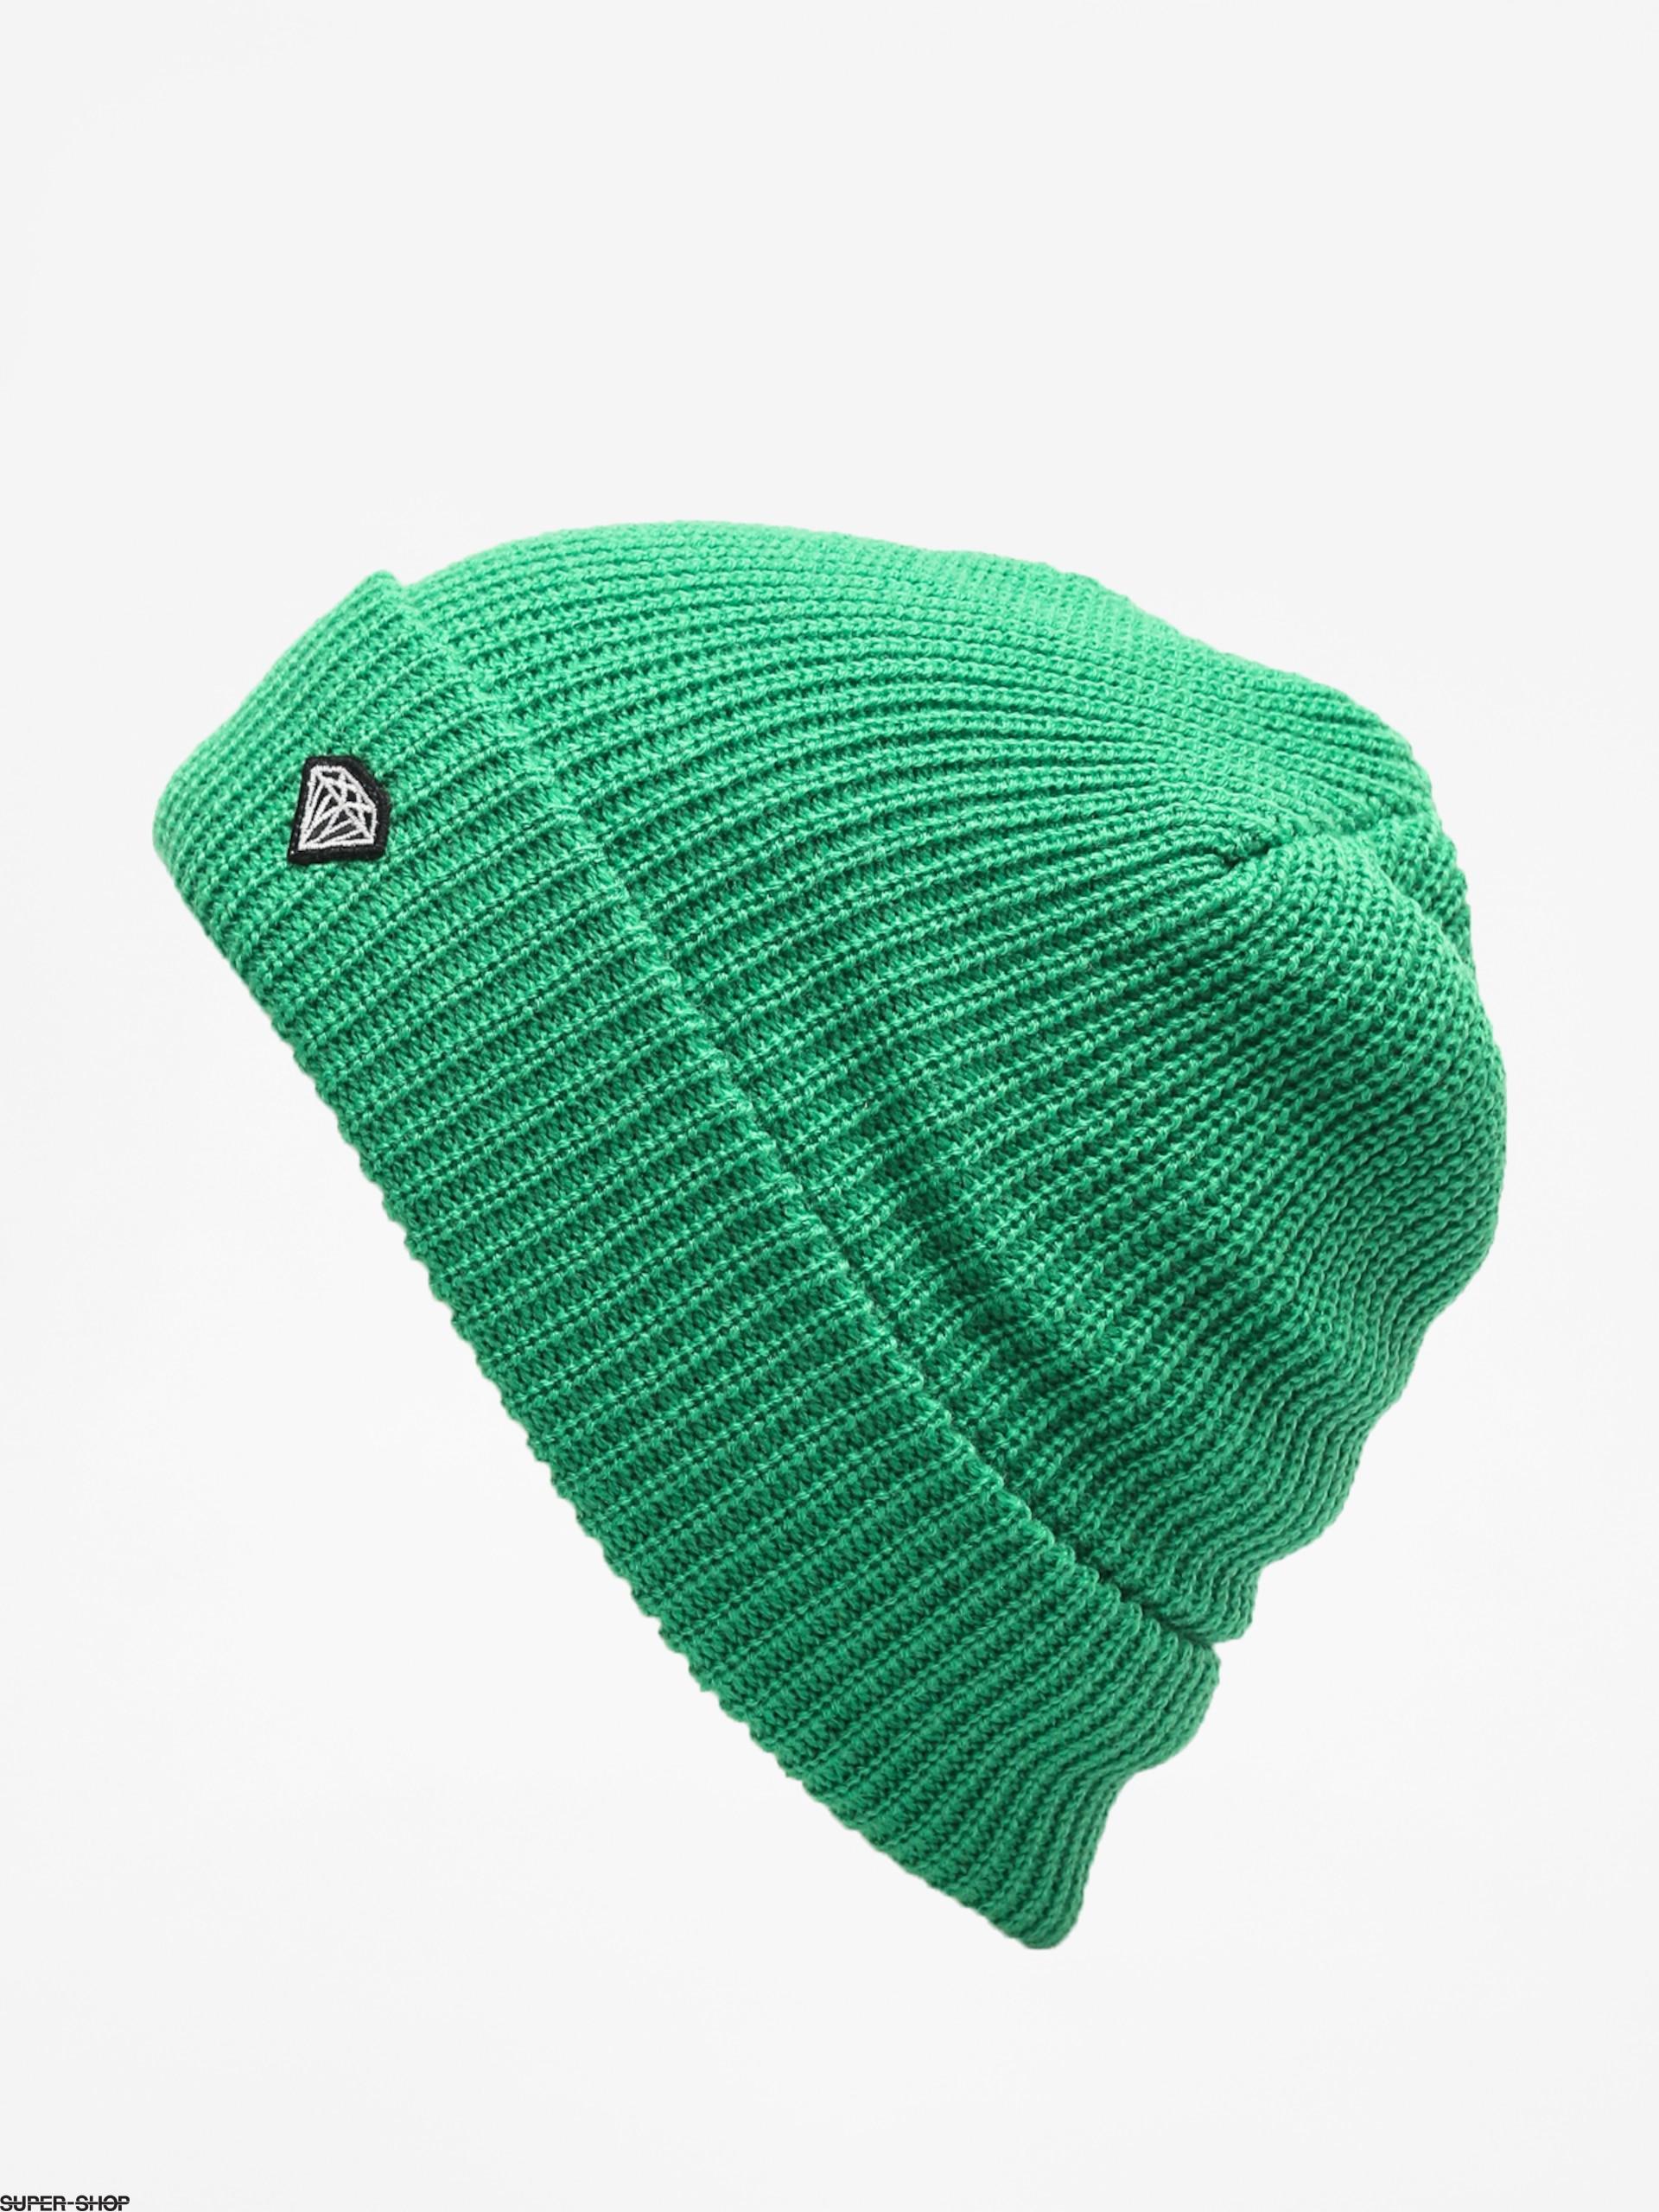 3ca2481d2f4 Diamond Supply Co. Brilliant Patch Beanie (kelly green)